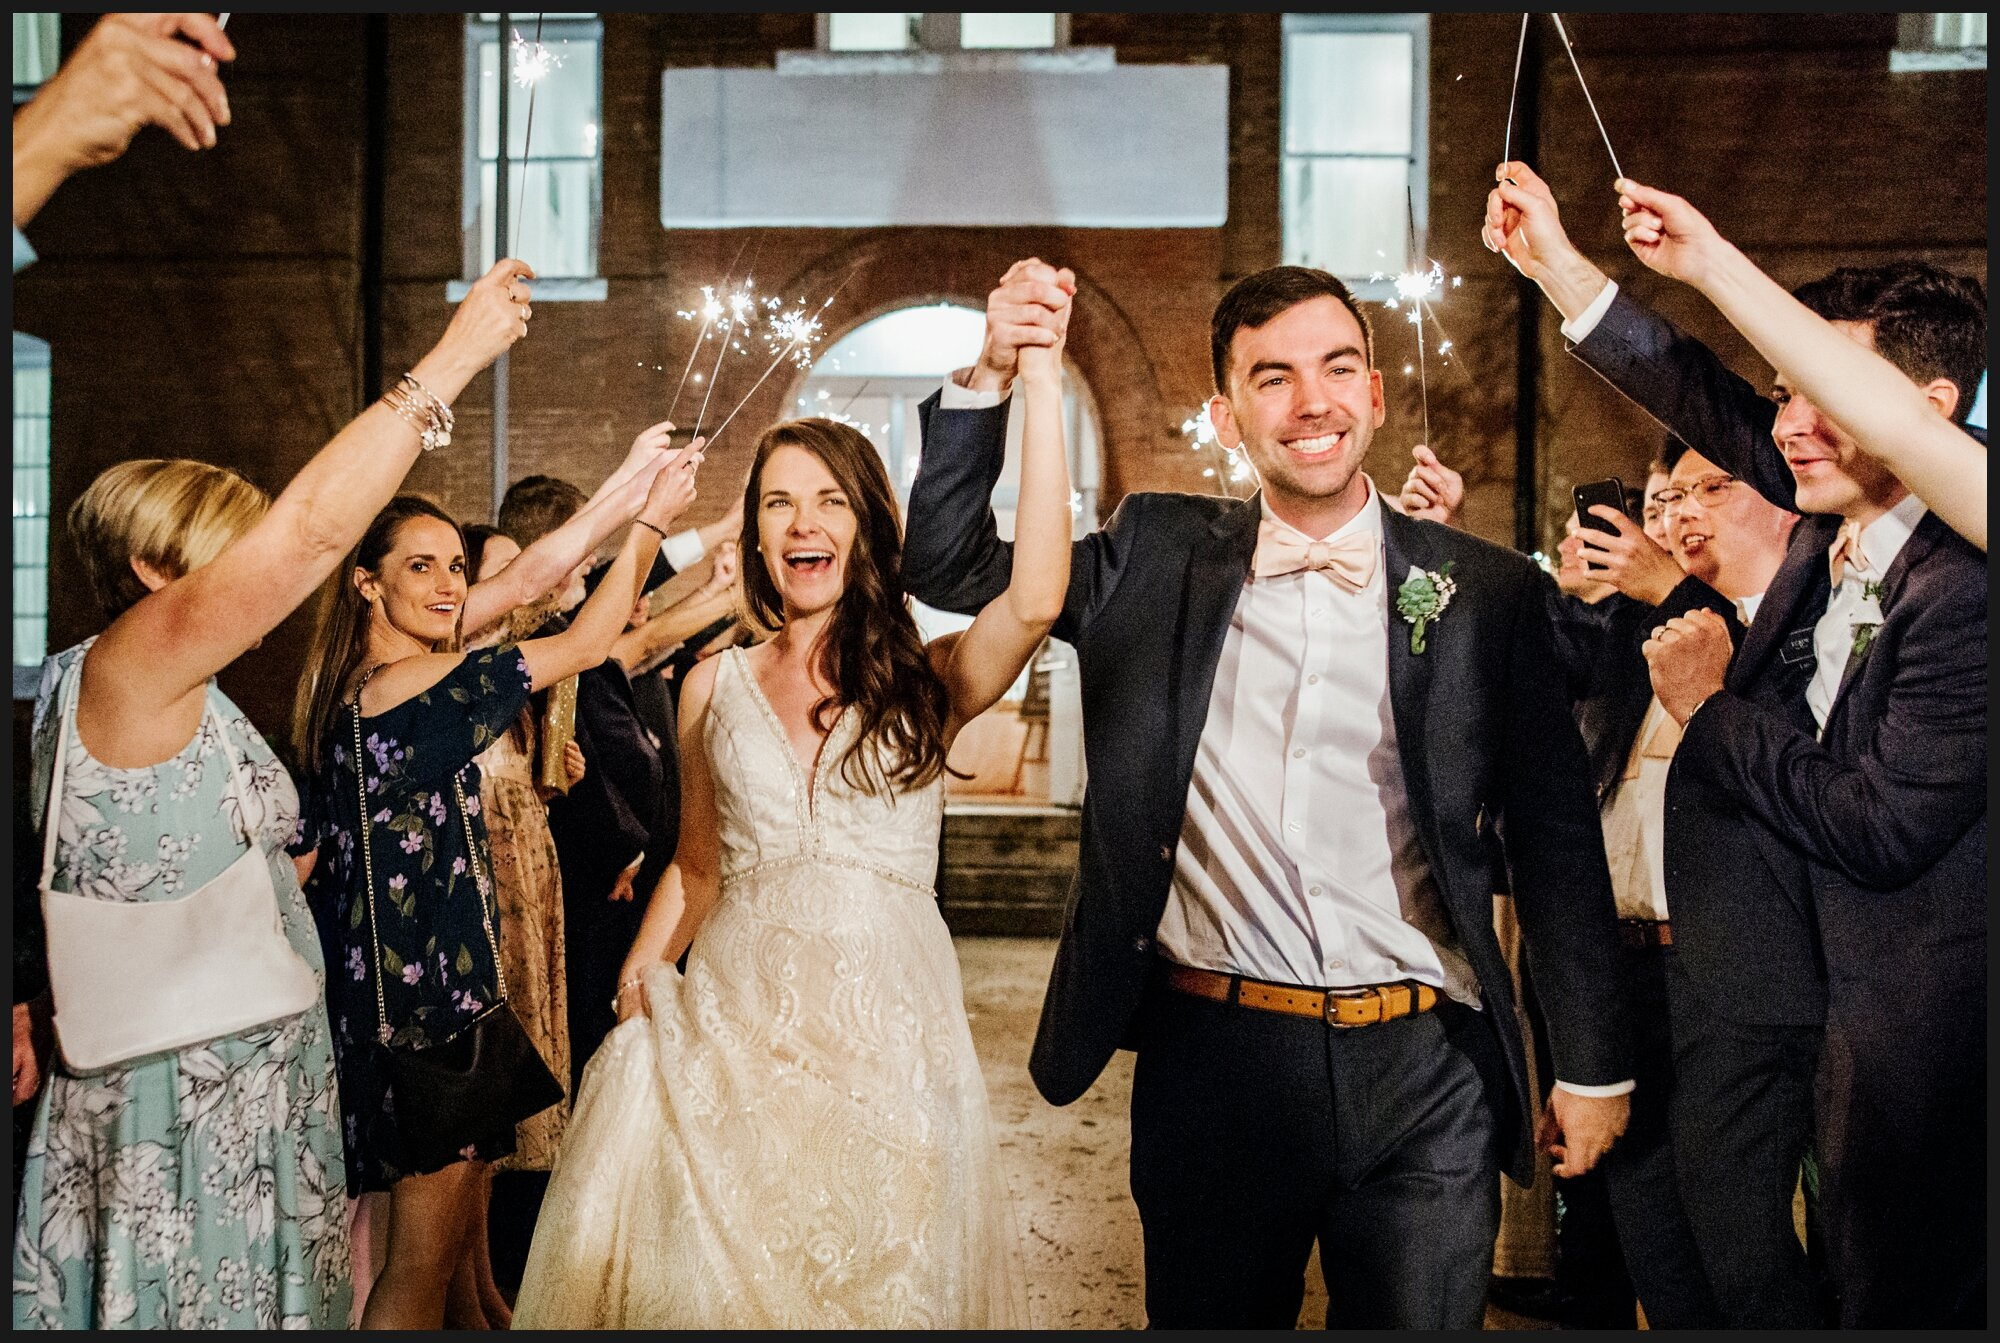 Orlando-Wedding-Photographer-destination-wedding-photographer-florida-wedding-photographer-hawaii-wedding-photographer_0697.jpg